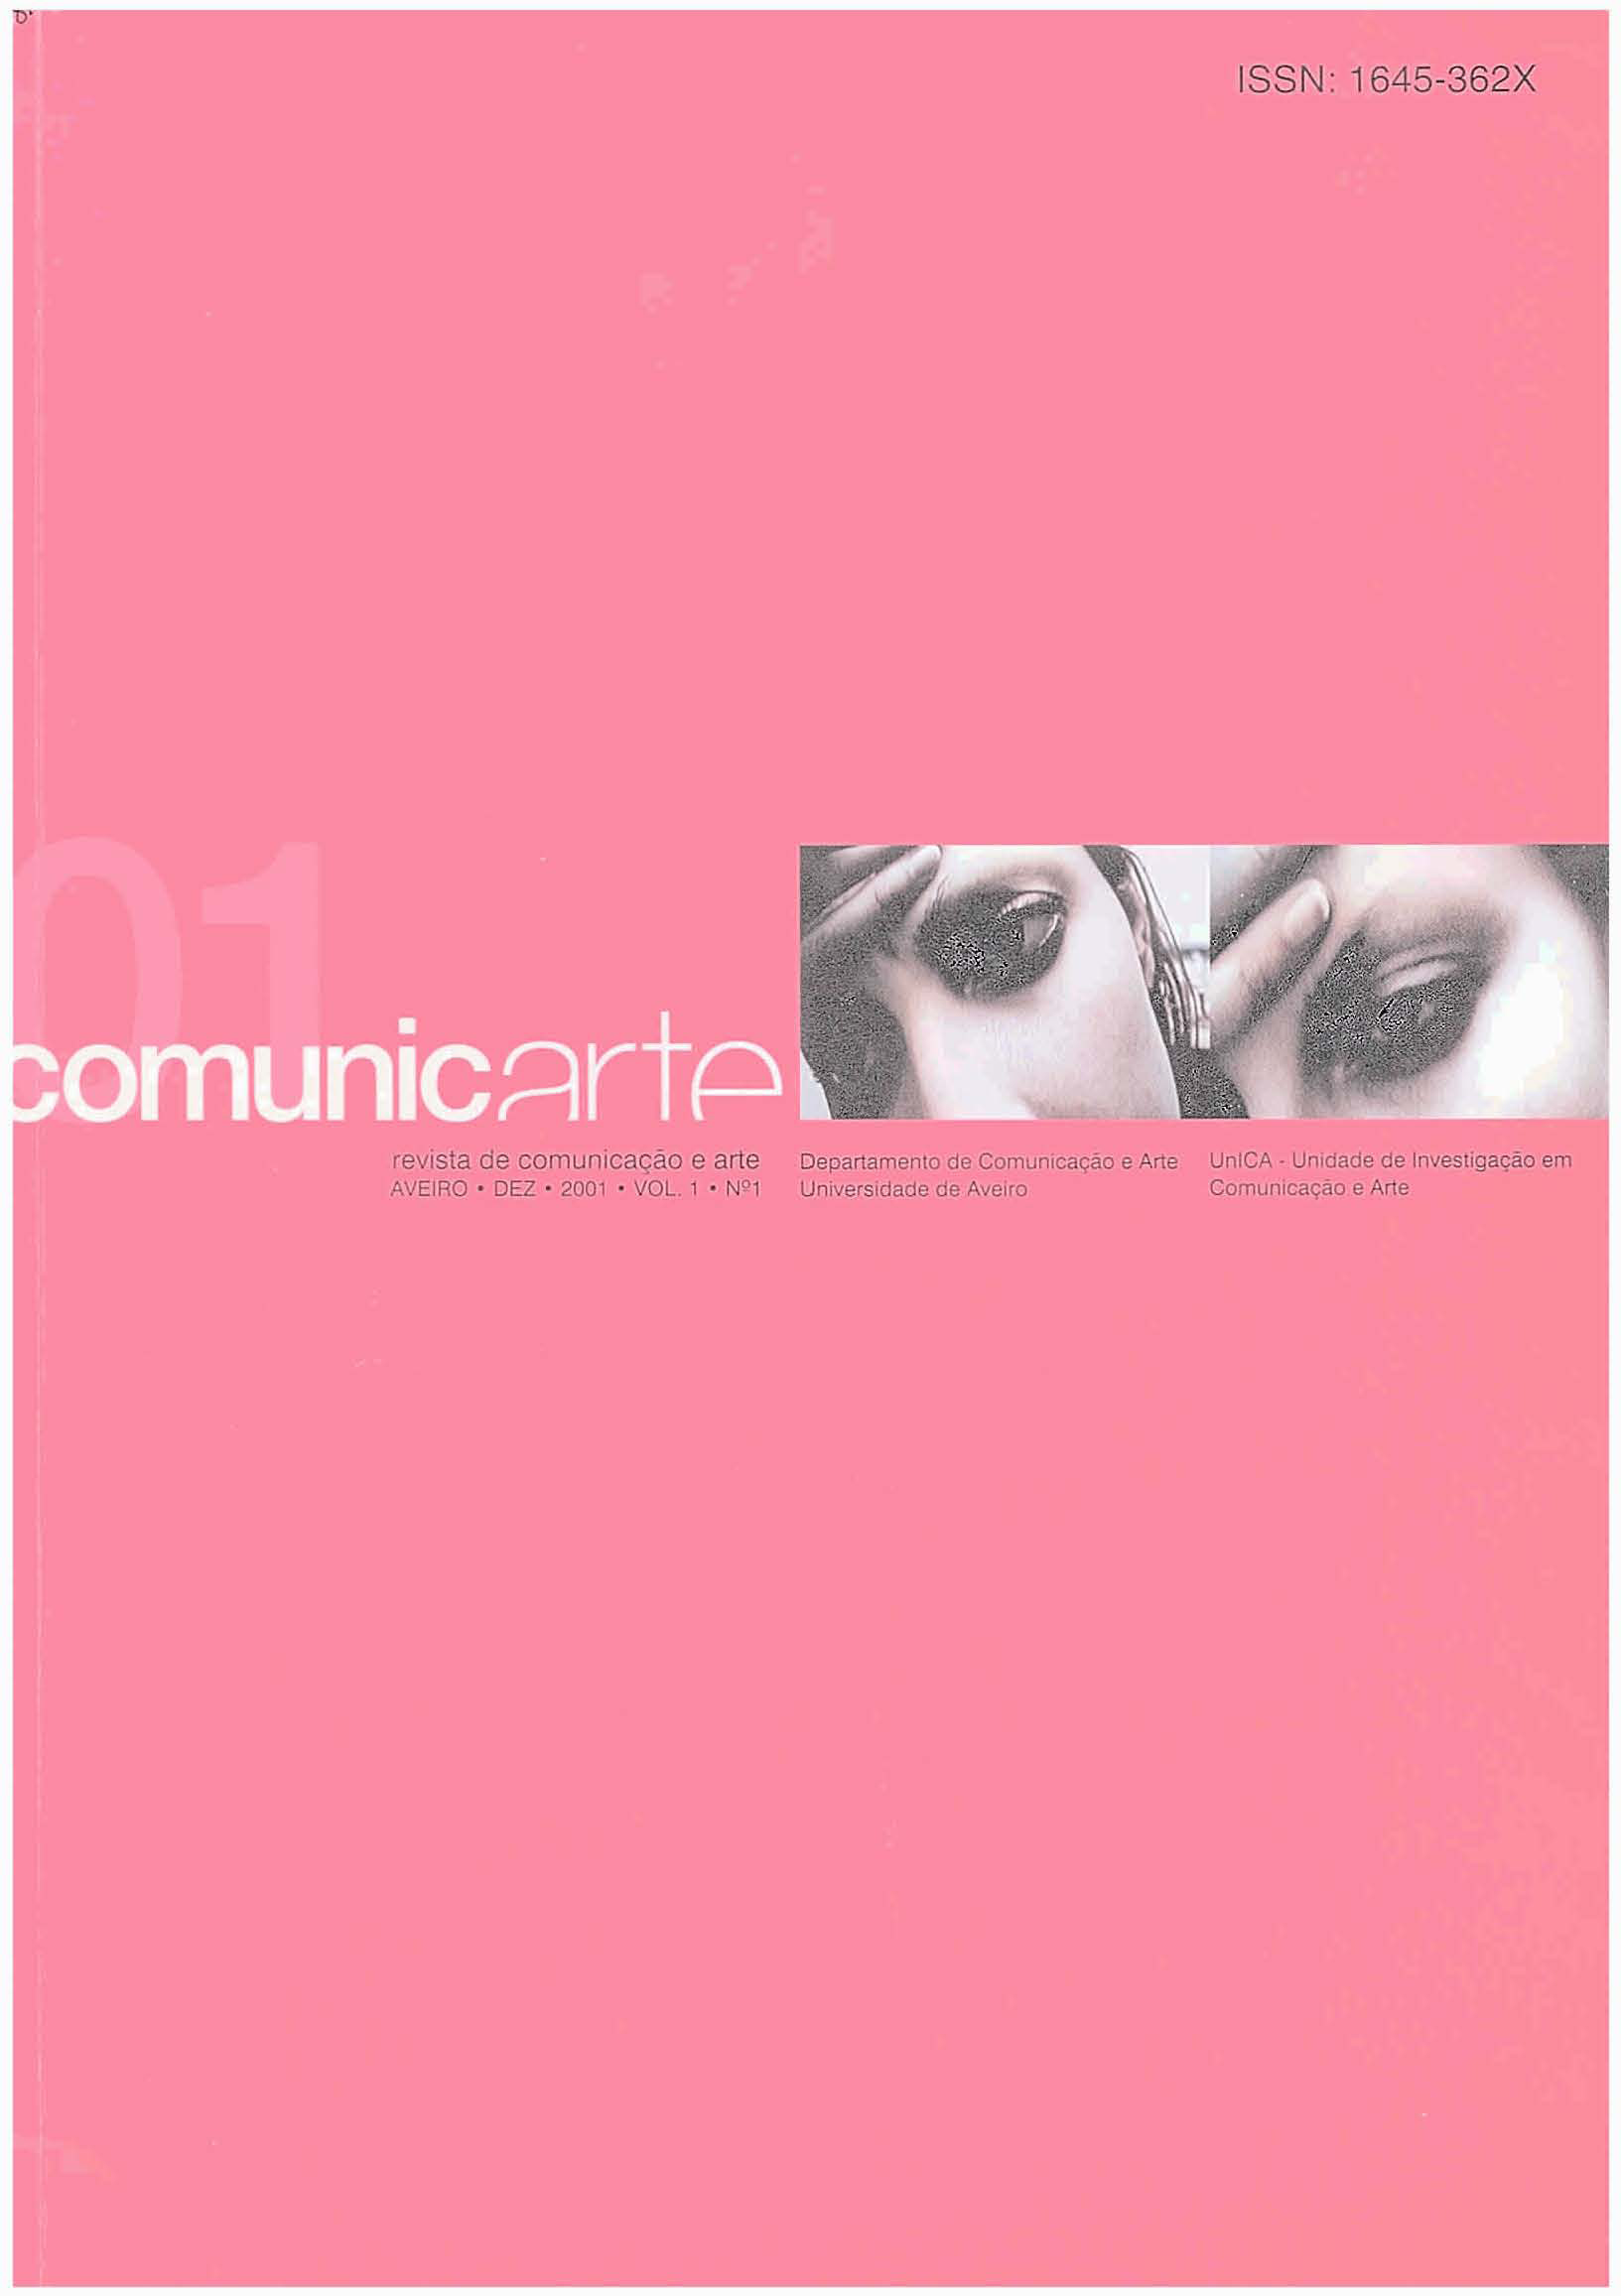 Capa do volume 1, número 1 (2001) da revista Comunicarte.